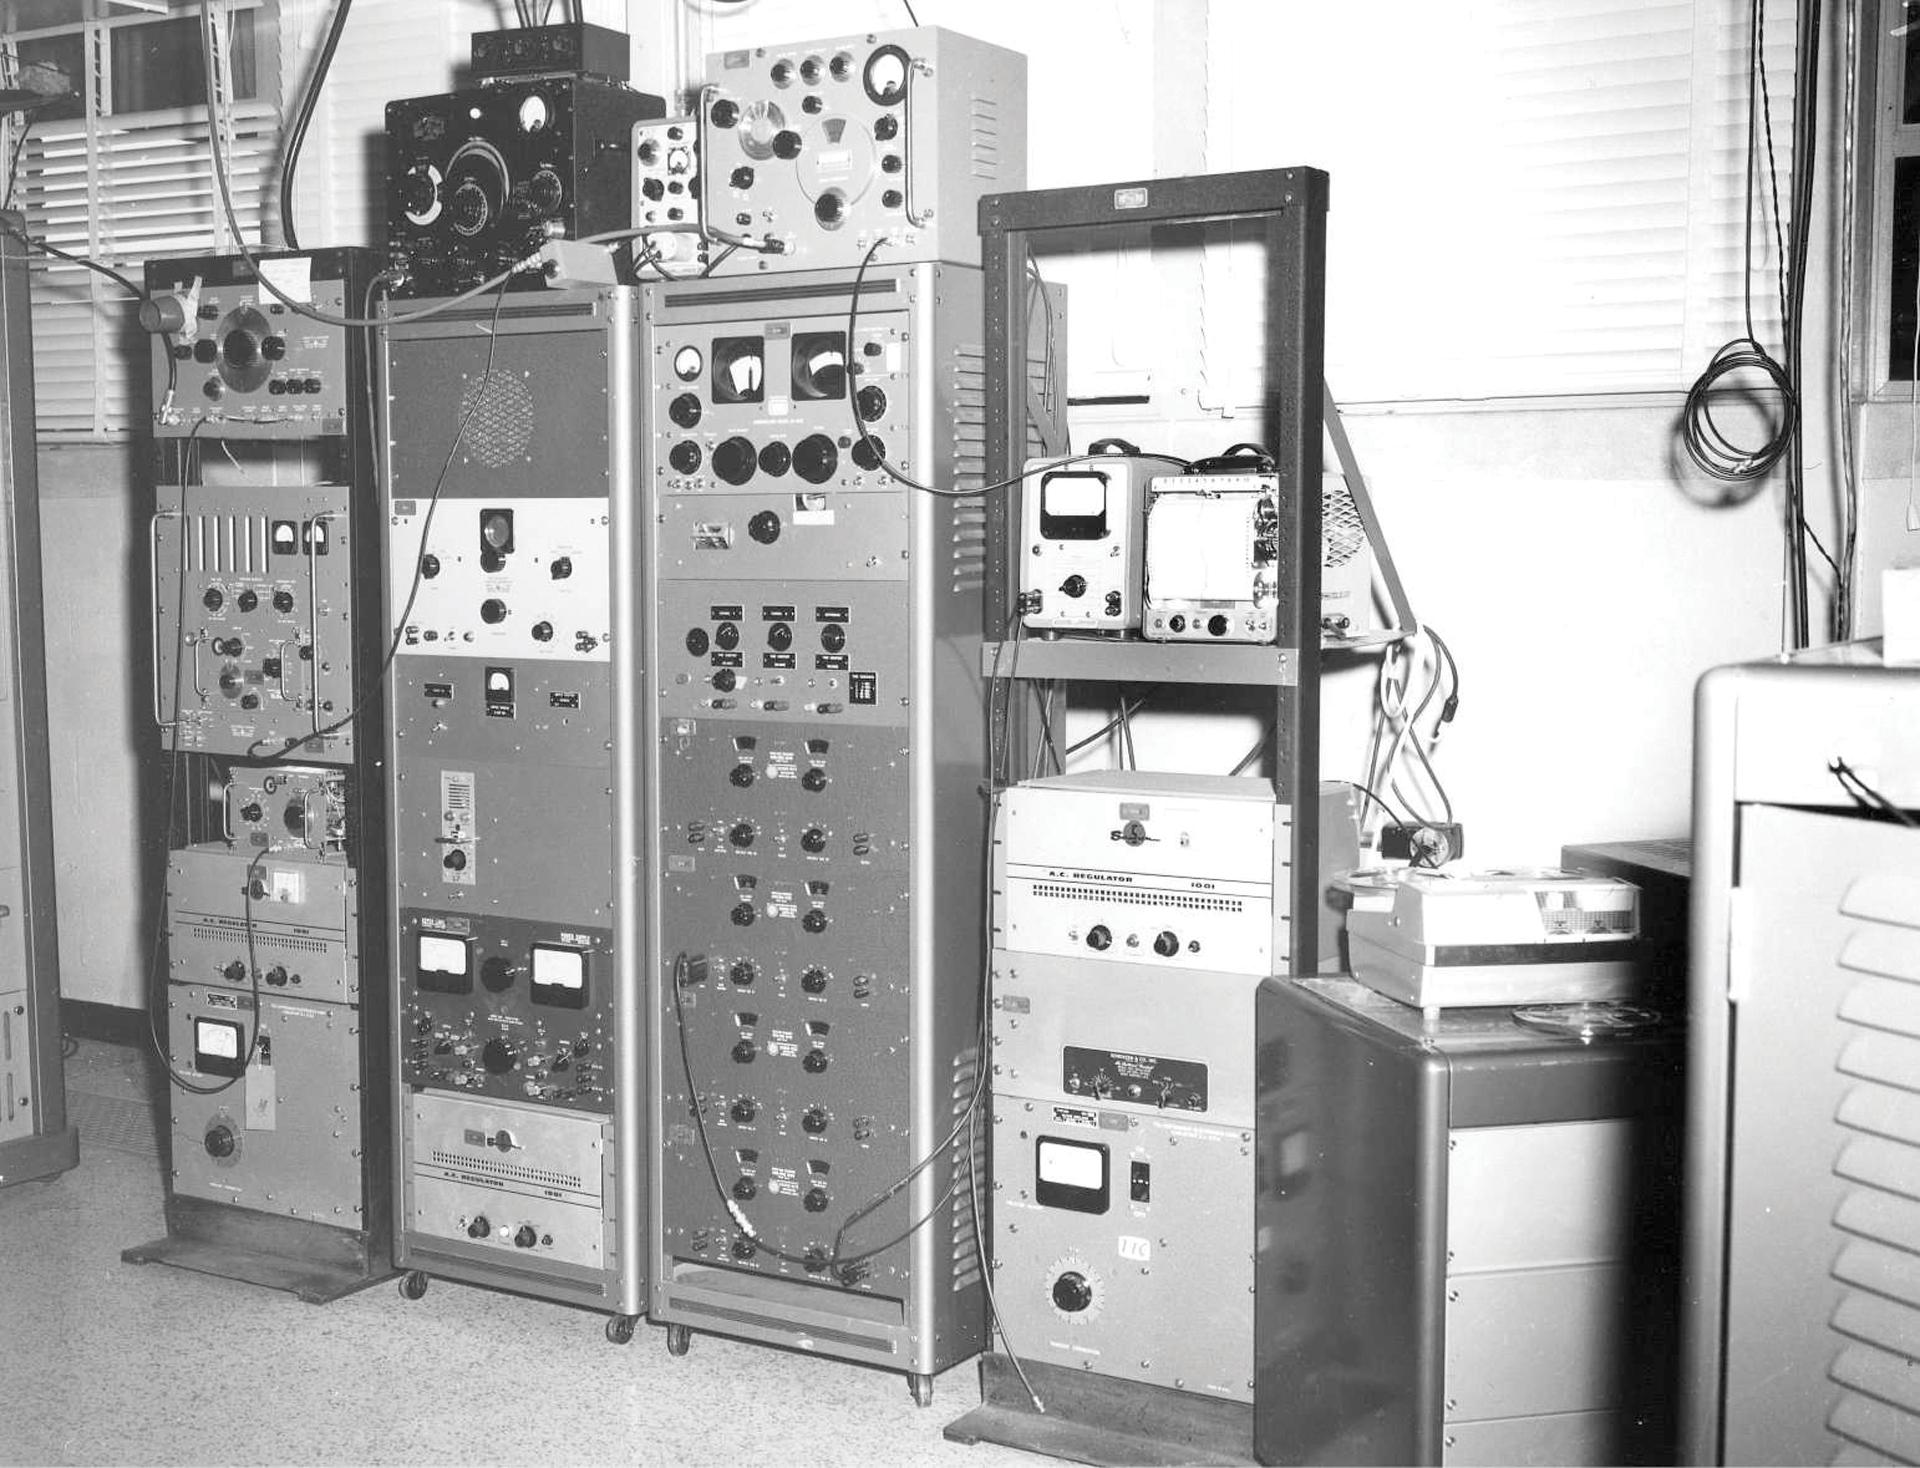 Project Ozma hardware